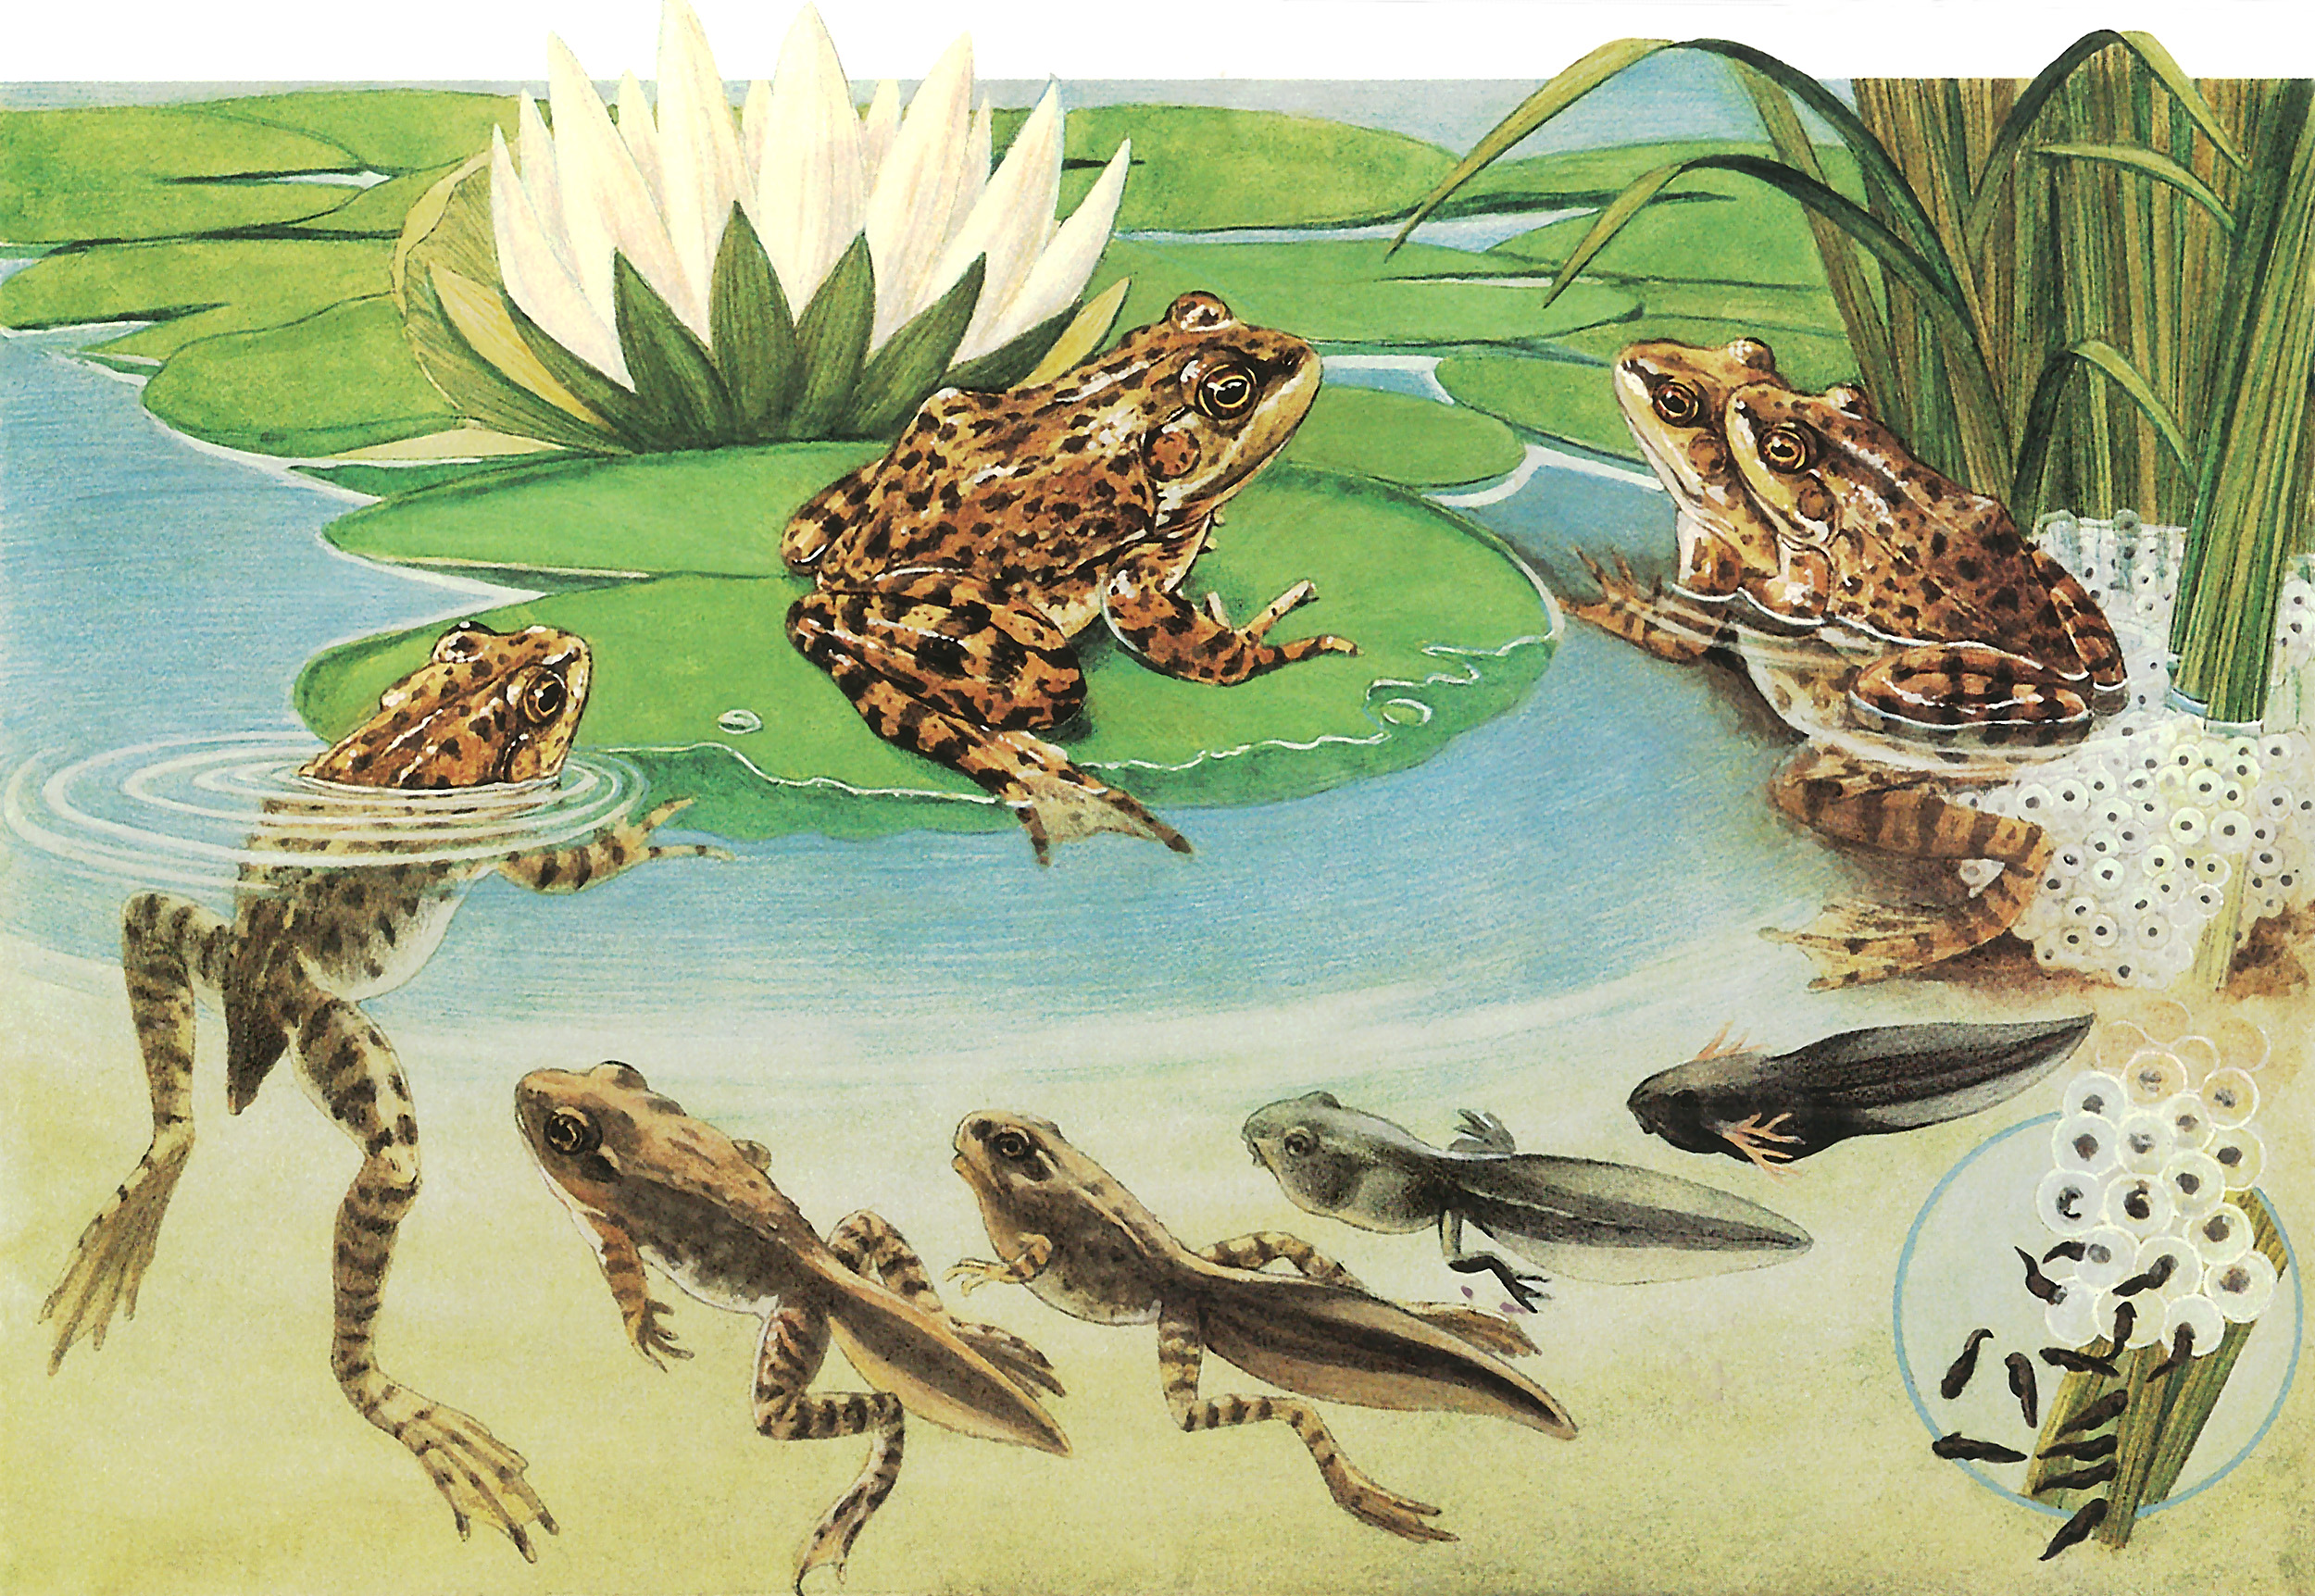 Toad gray: lifestyle, reproduction, photo, description